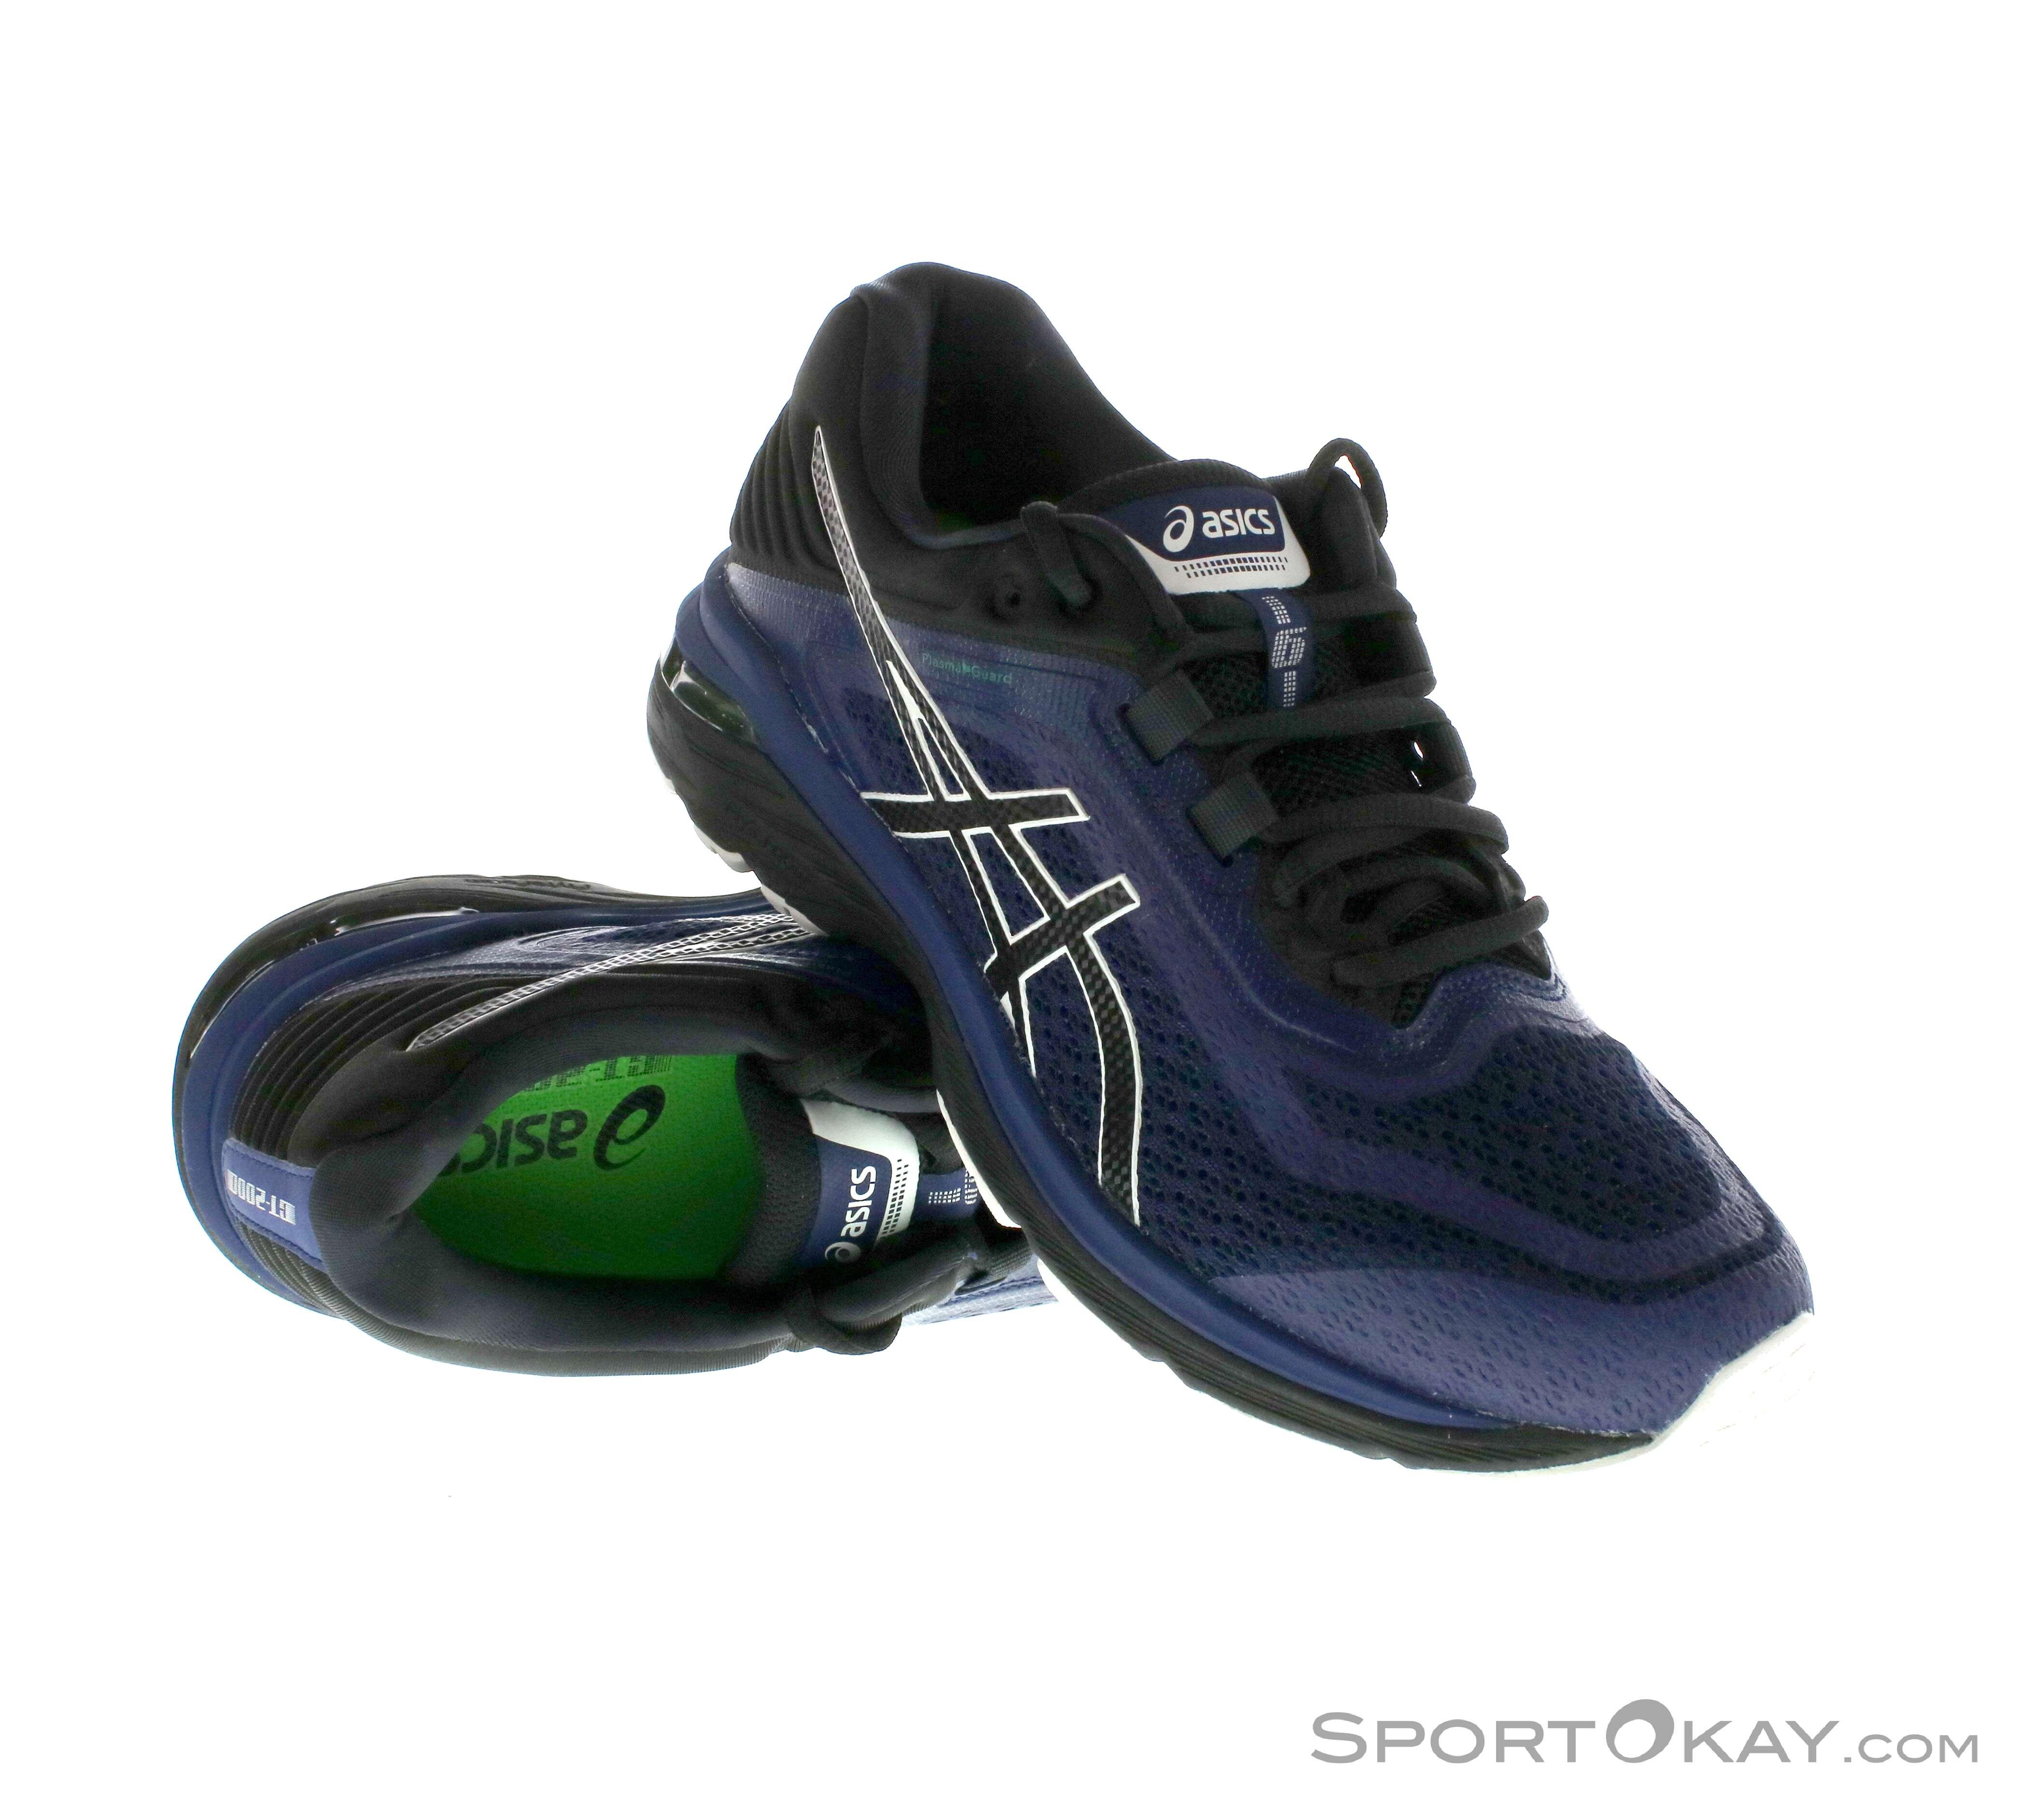 56eaee100ff Asics GT 2000 6 Trail Plasma Guard Mens Trail Running Shoes, Asics, Blue,